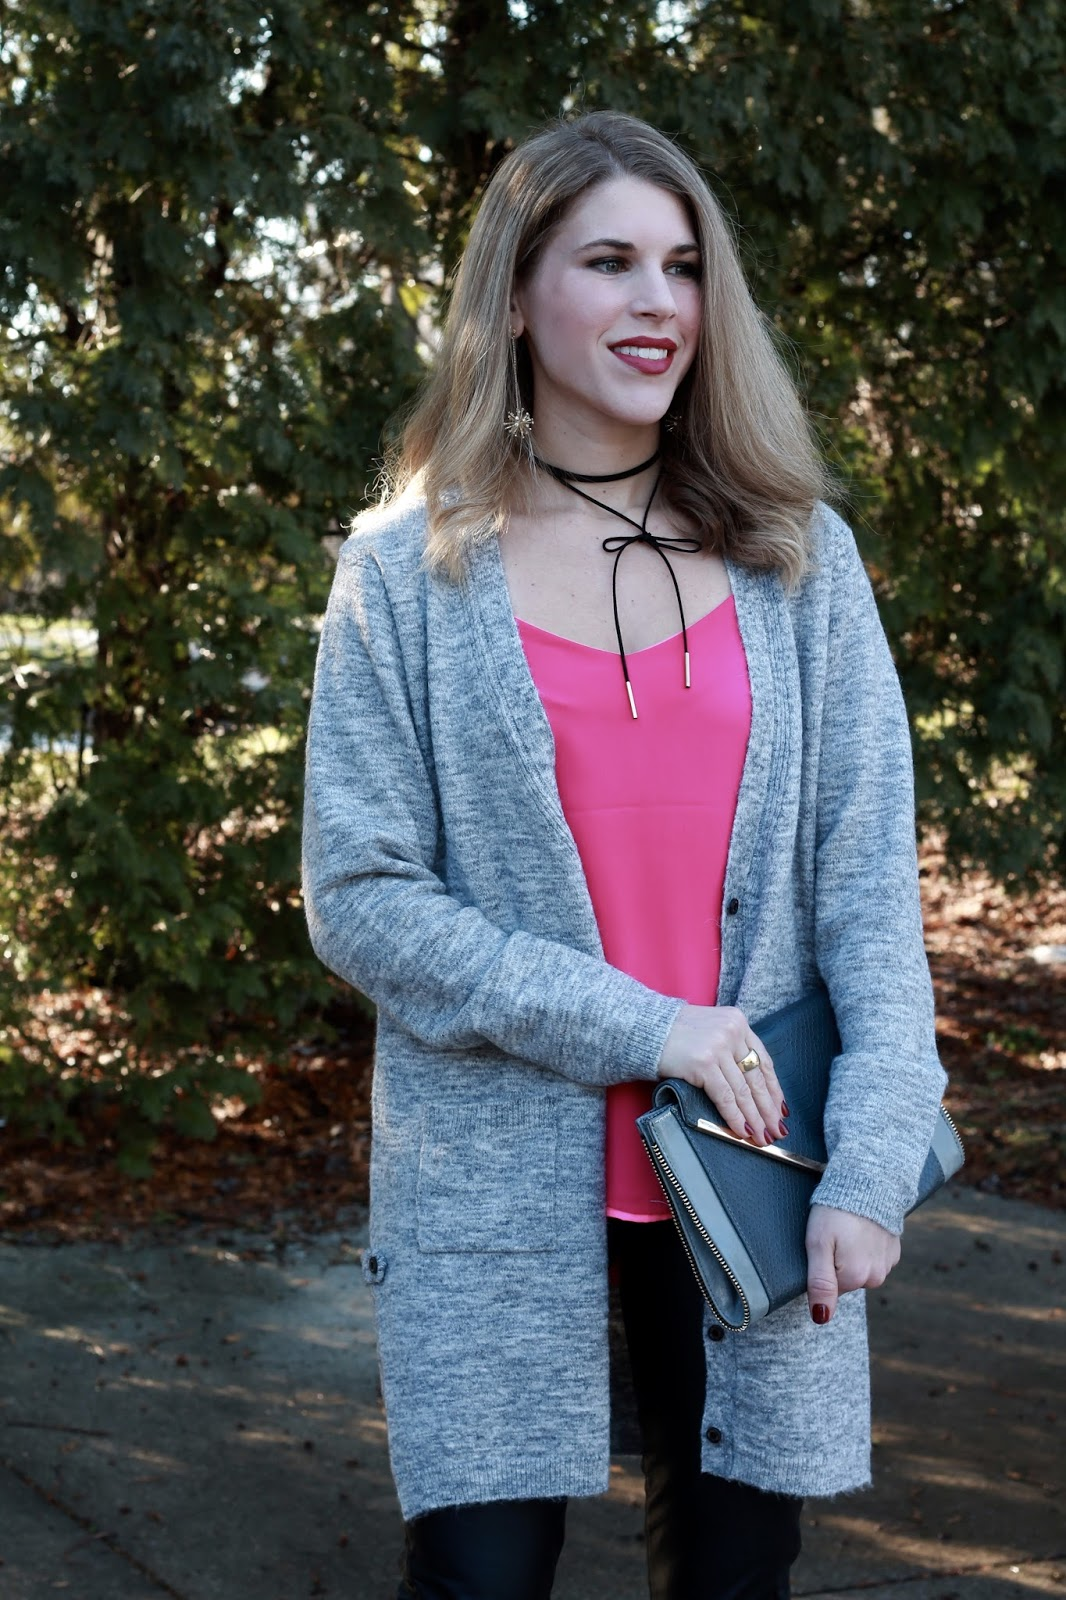 pink Barcelona cami, grey boyfriend cardigan, leather pants, pink heels, grey clutch, Valentine's Day look